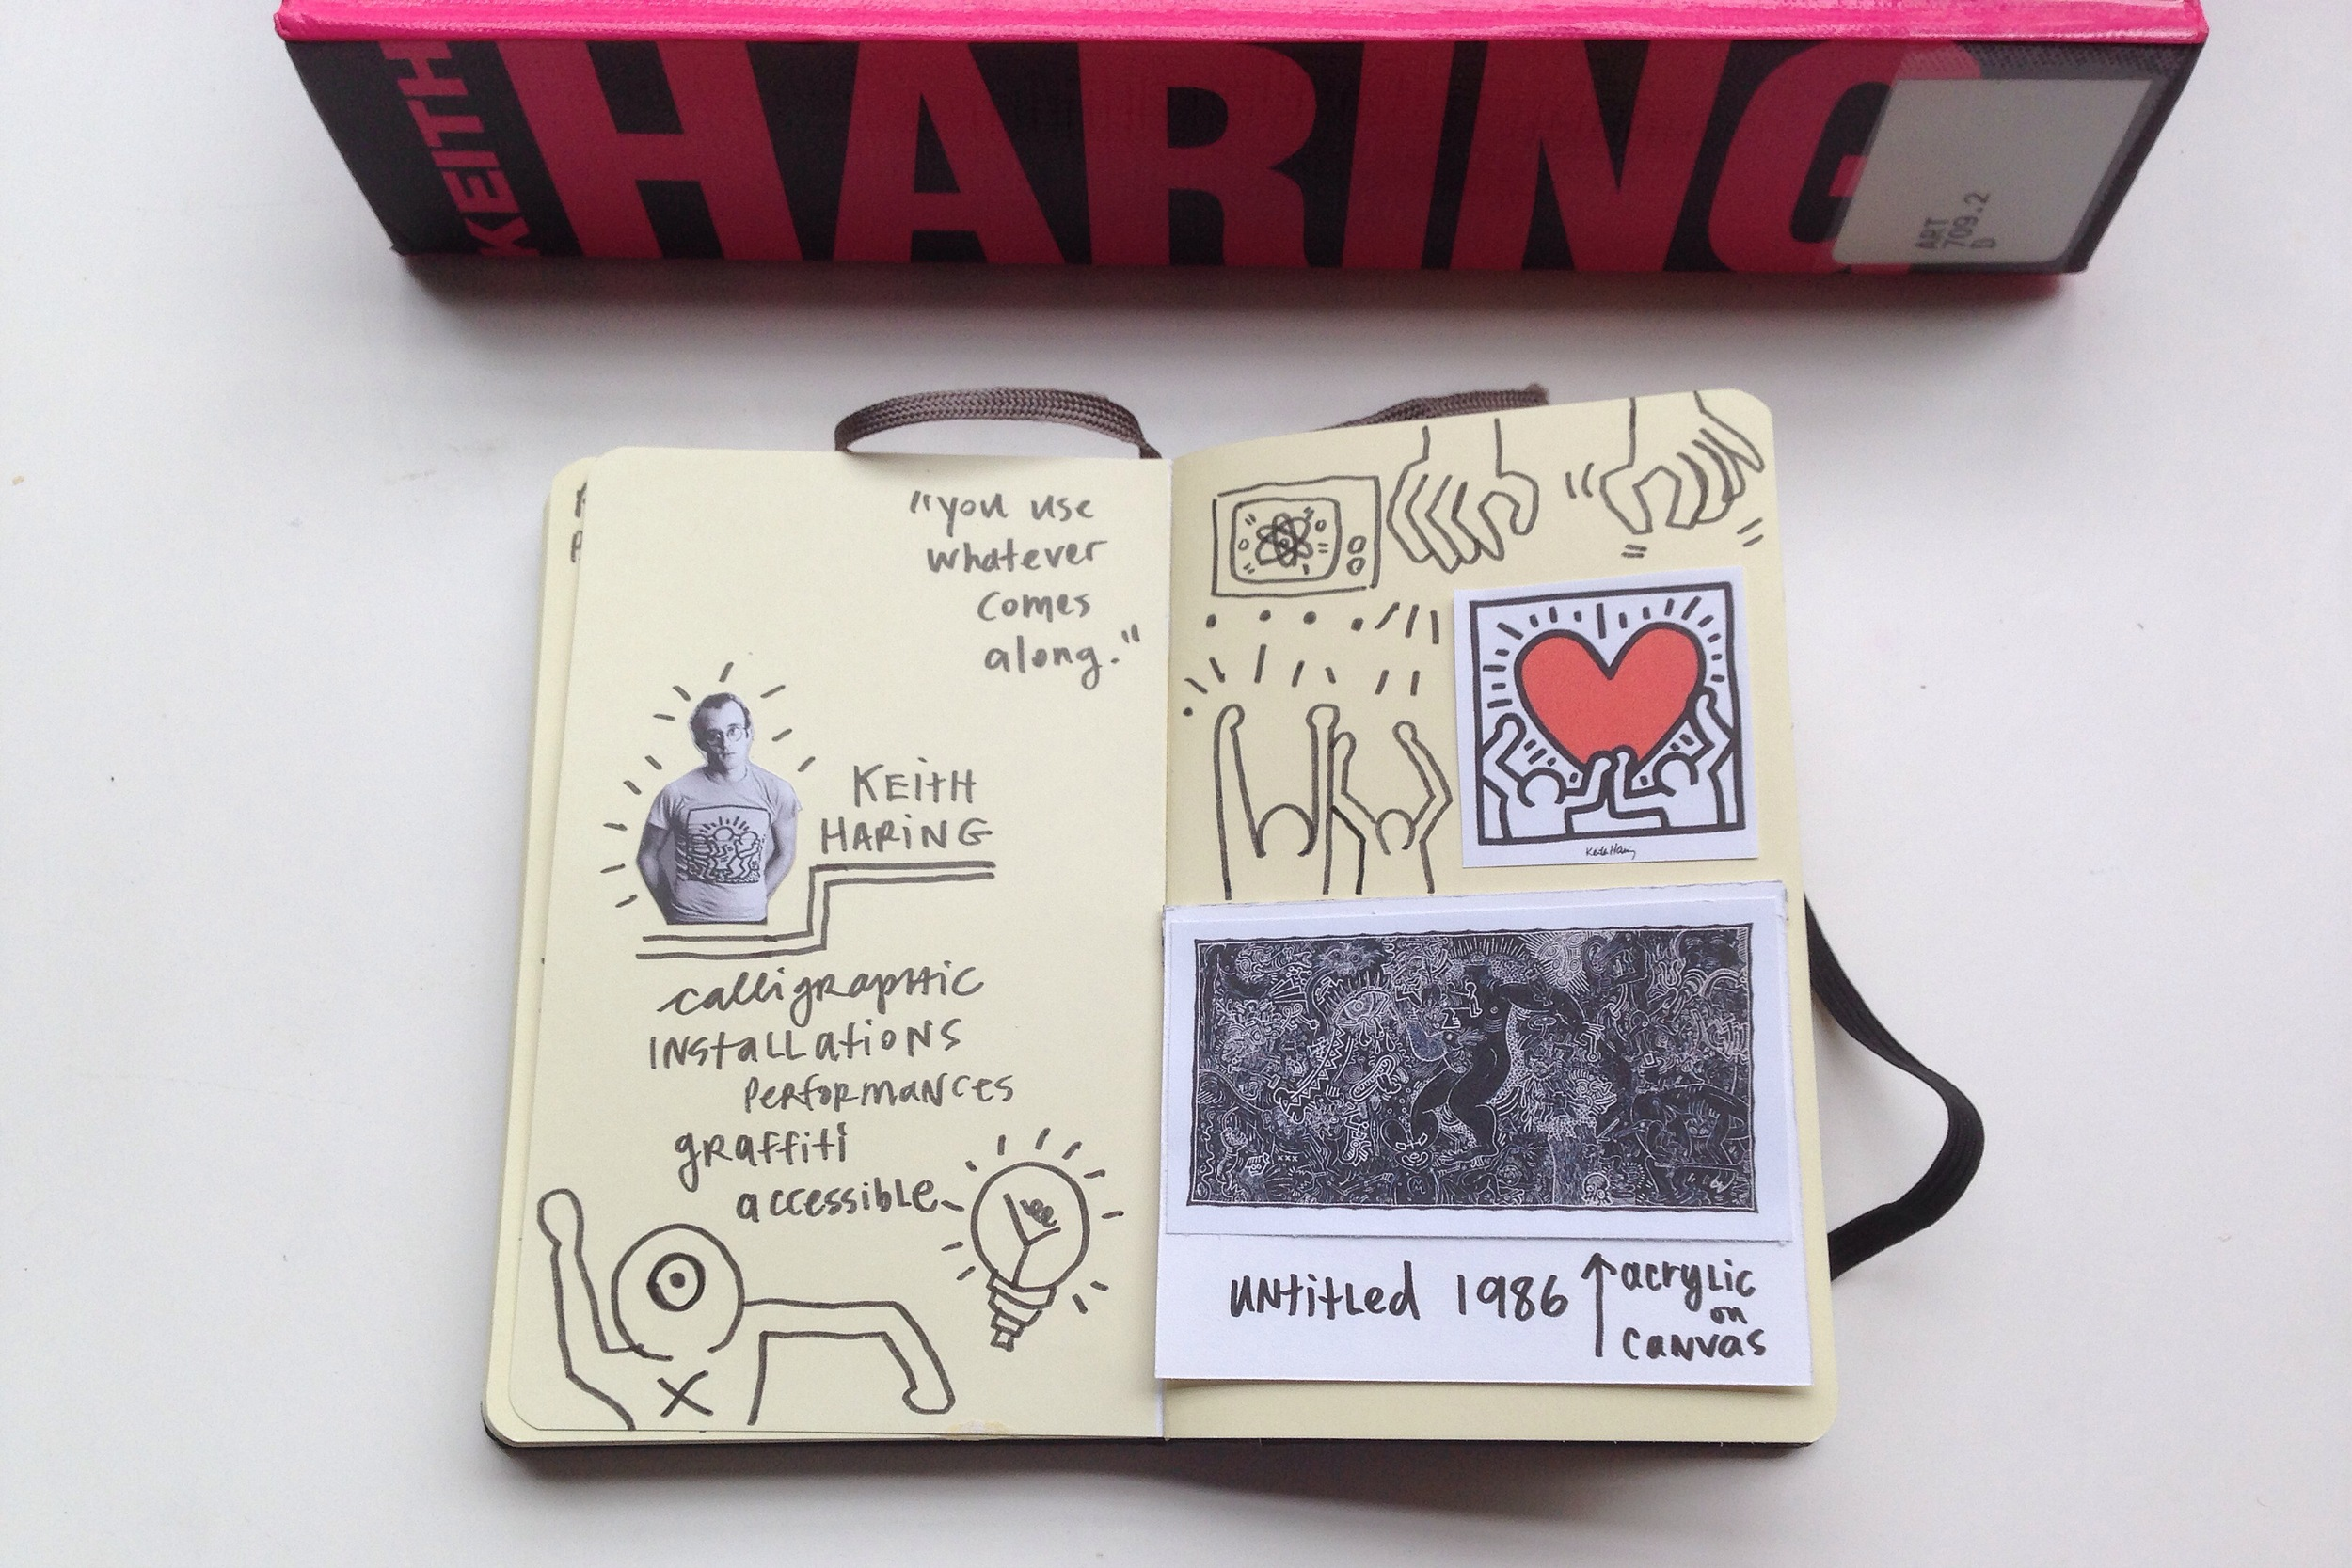 keith haring | year of creative habits